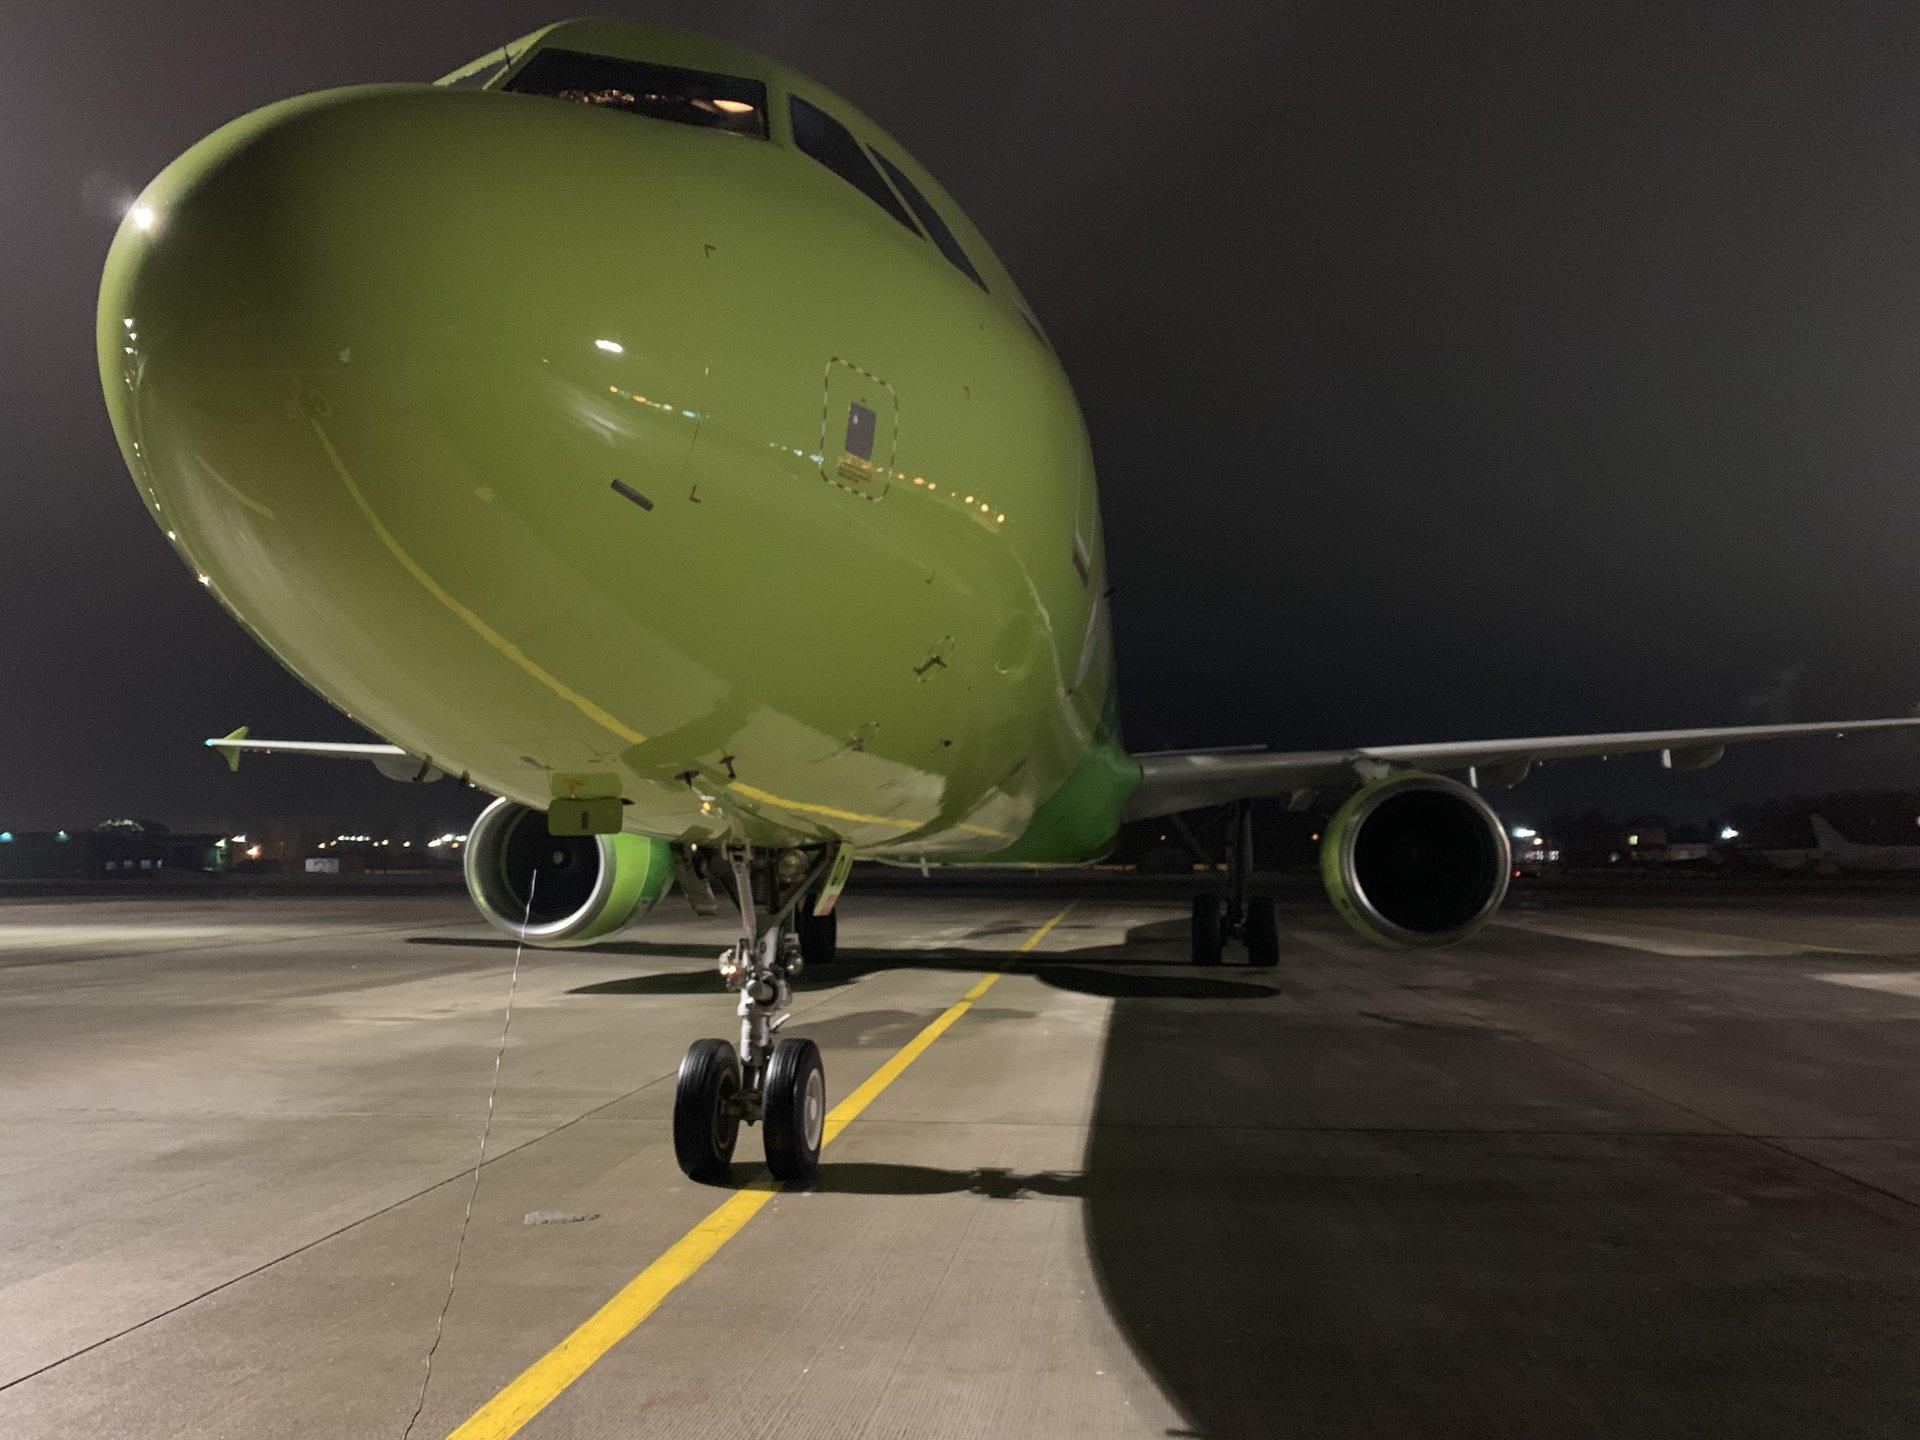 7A7605A0-DC95-4D46-9093-4B48567AFD5F.jpeg